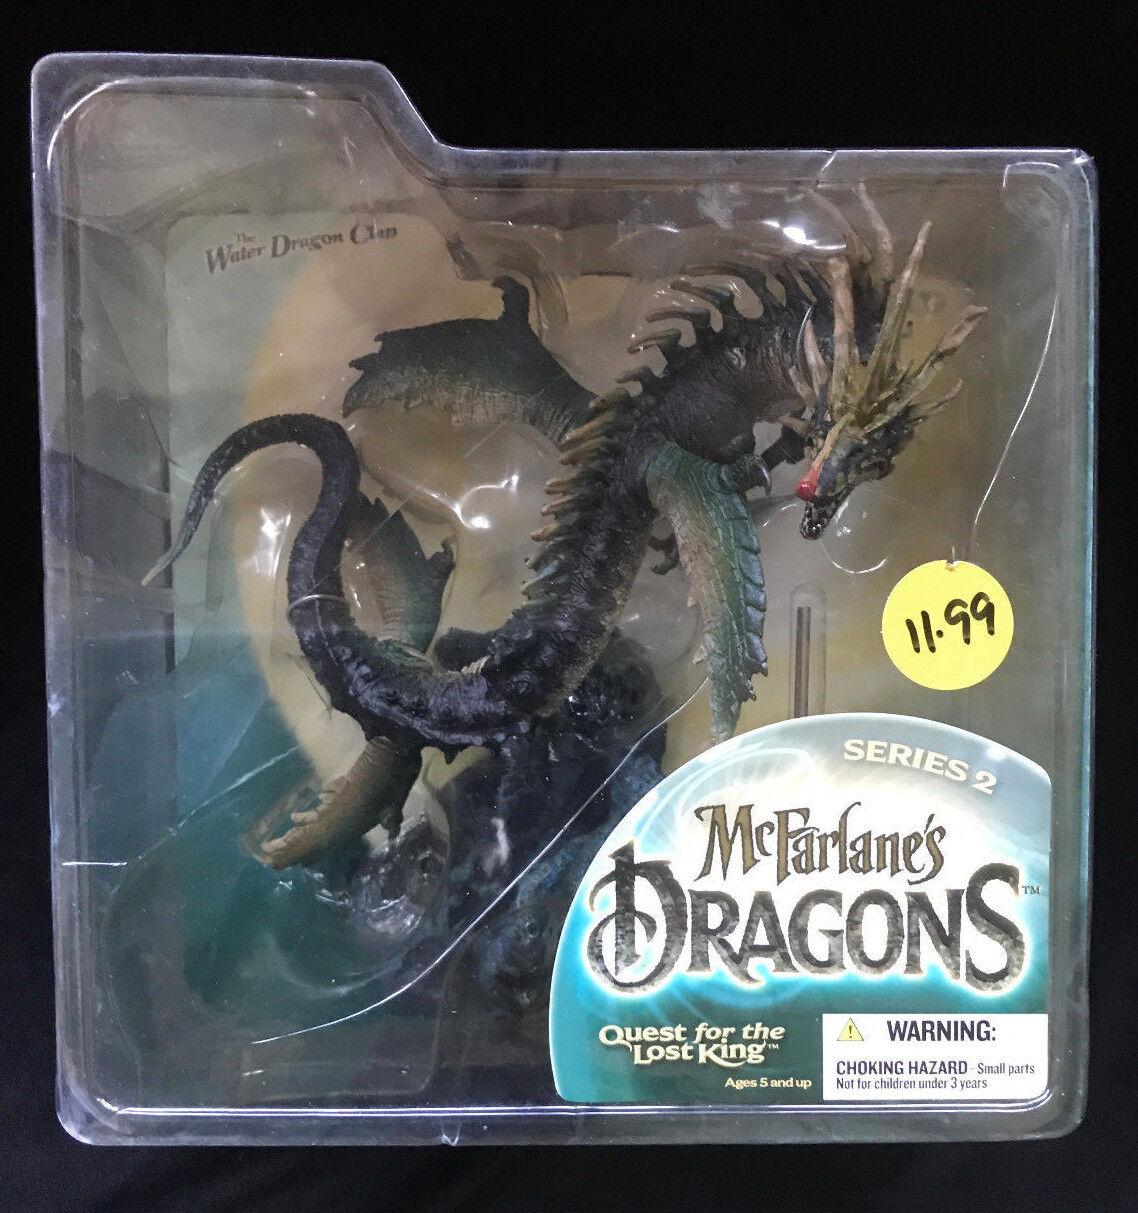 McFarlane/'s Dragons Series 2 Water Dragon Clan Action Figure Sealed MOC MISB